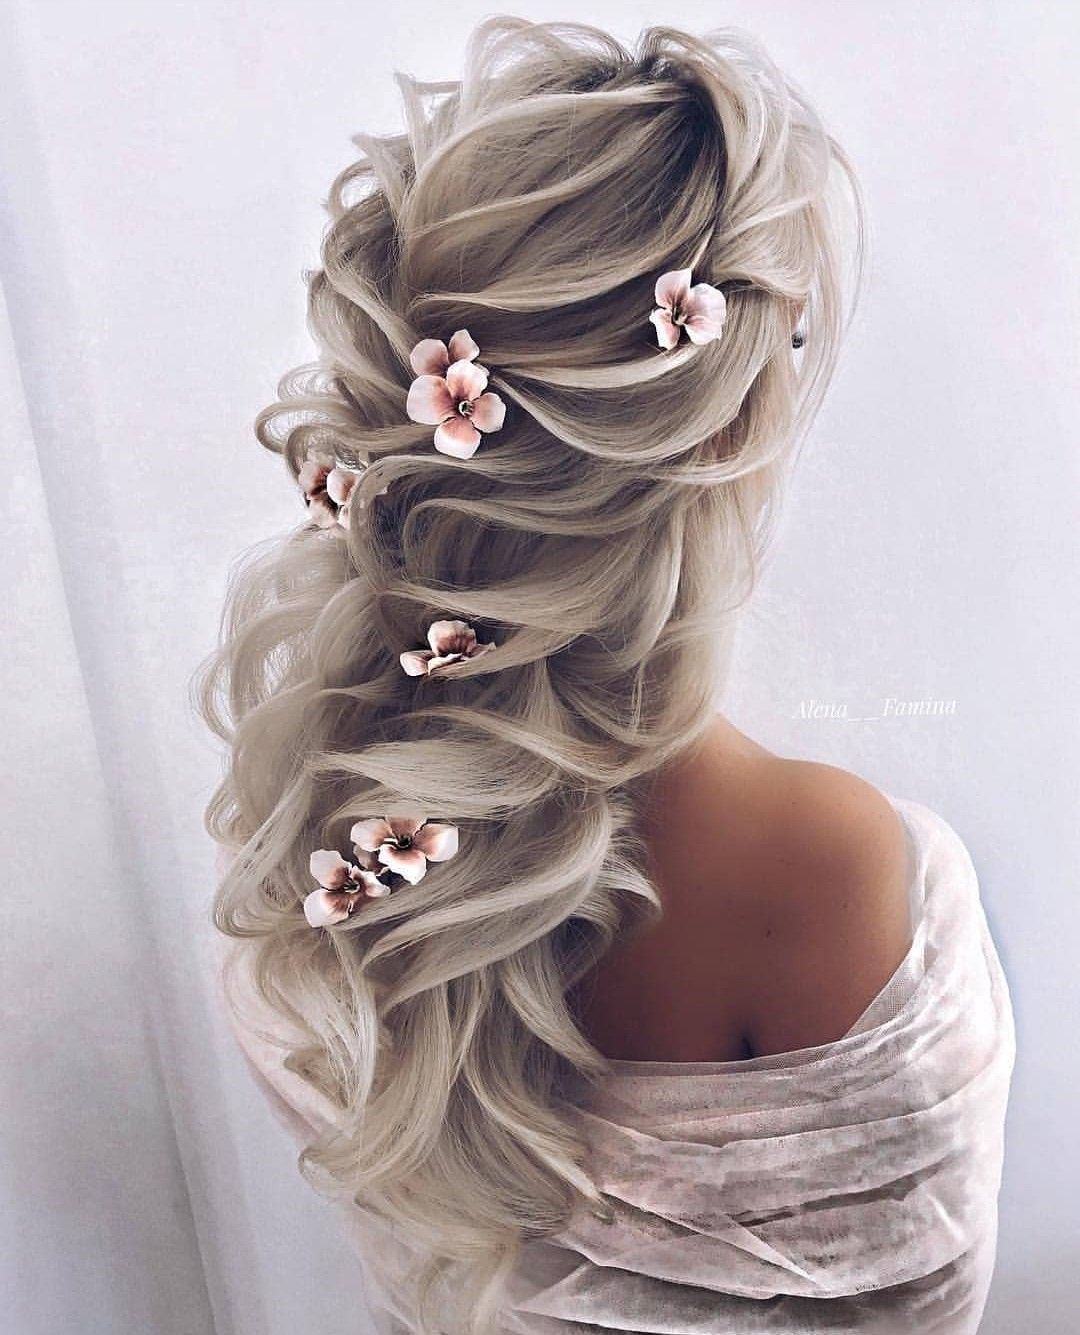 Pin by sydney brand on weddings in pinterest hair styles